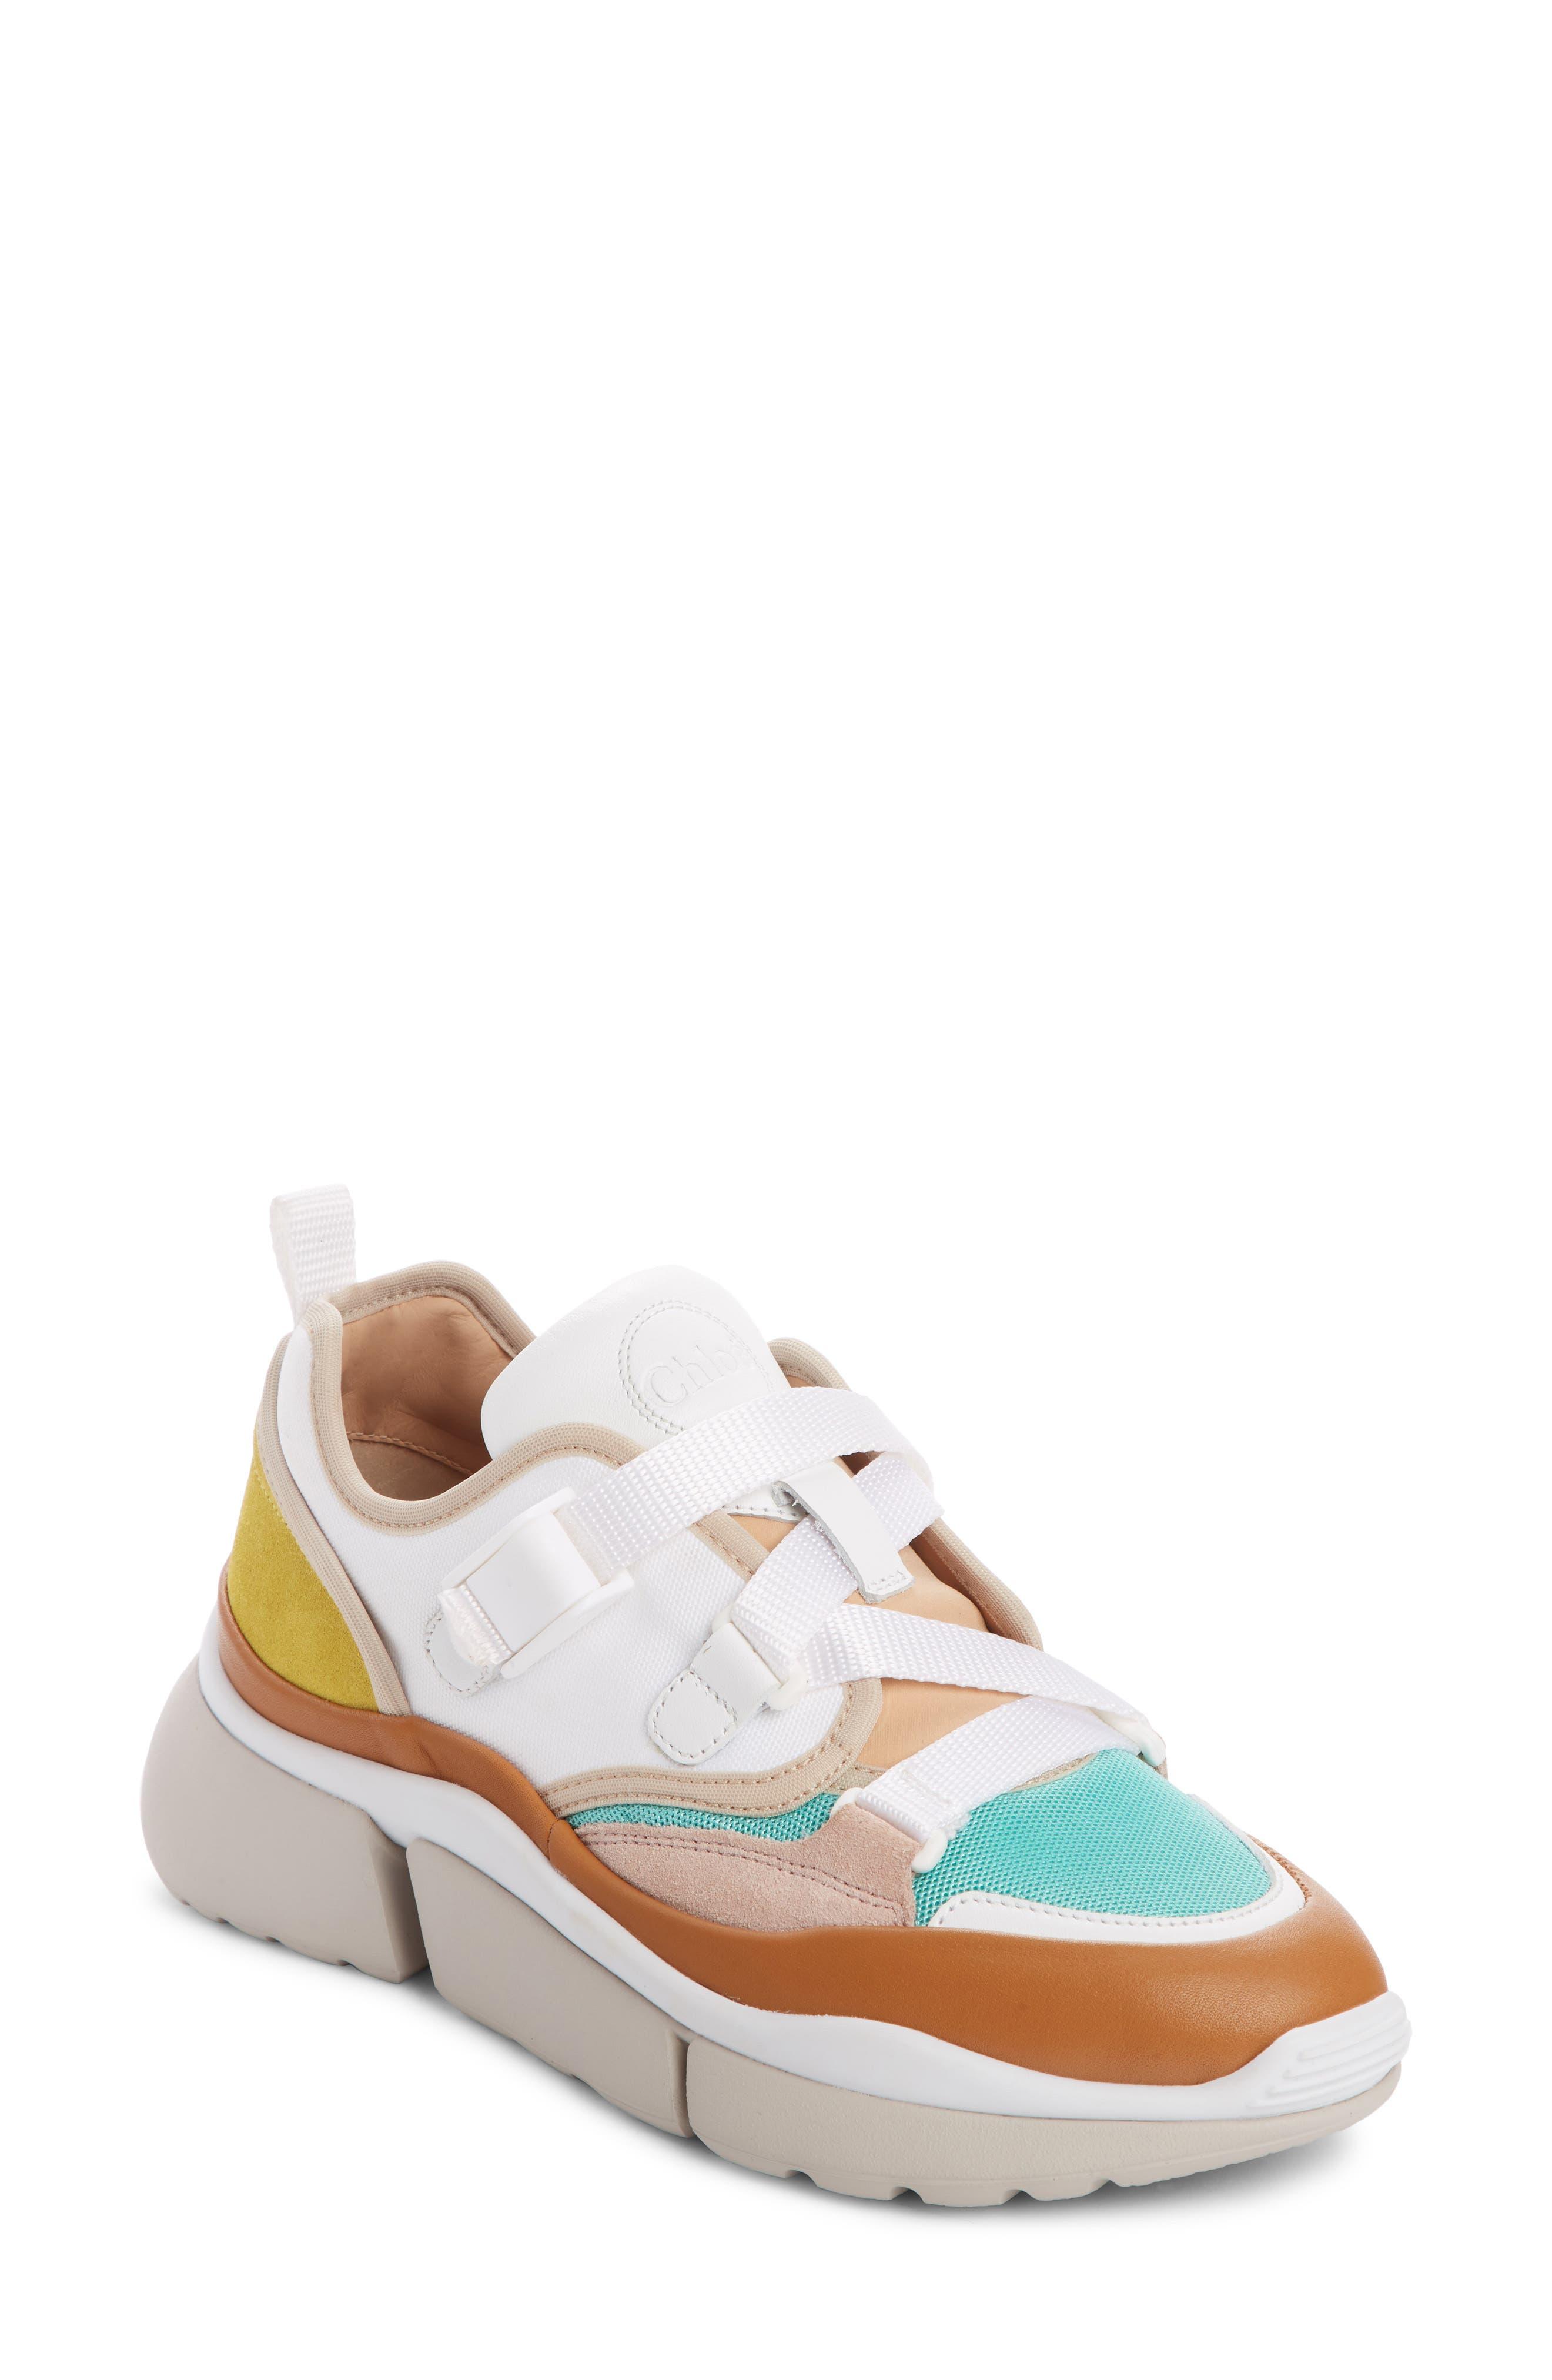 Chloe Sonnie Low Top Sneaker, White